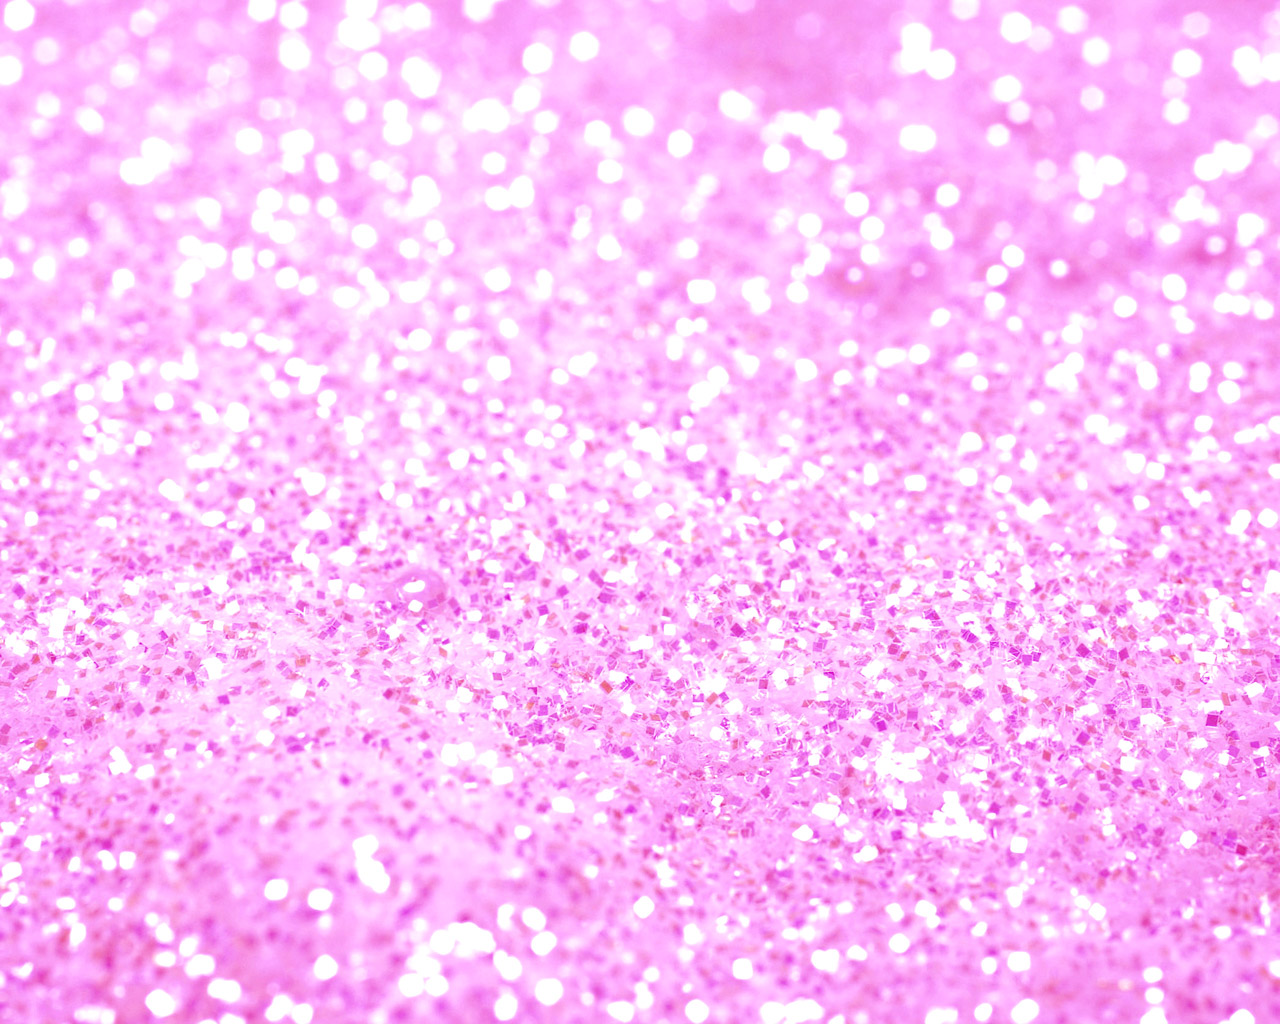 Download Lillas Gifs Dividers Rosa Glitterpink And Glitter